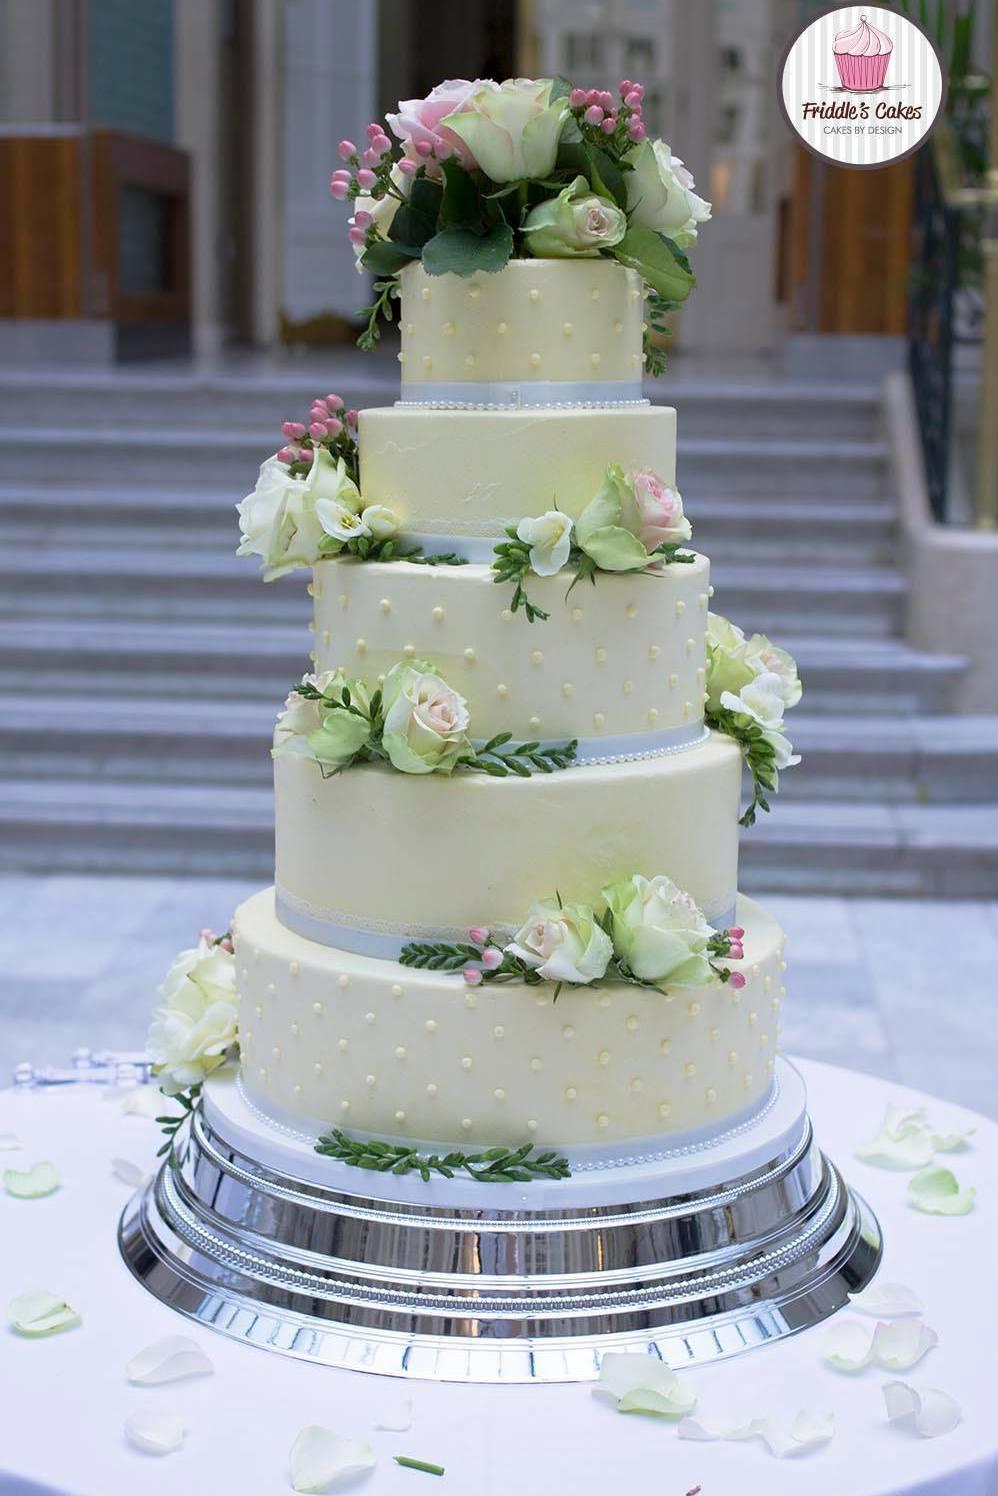 Napier Cake Stand-Wedding Cake Stand-Birthday Cake Stand-cakestand